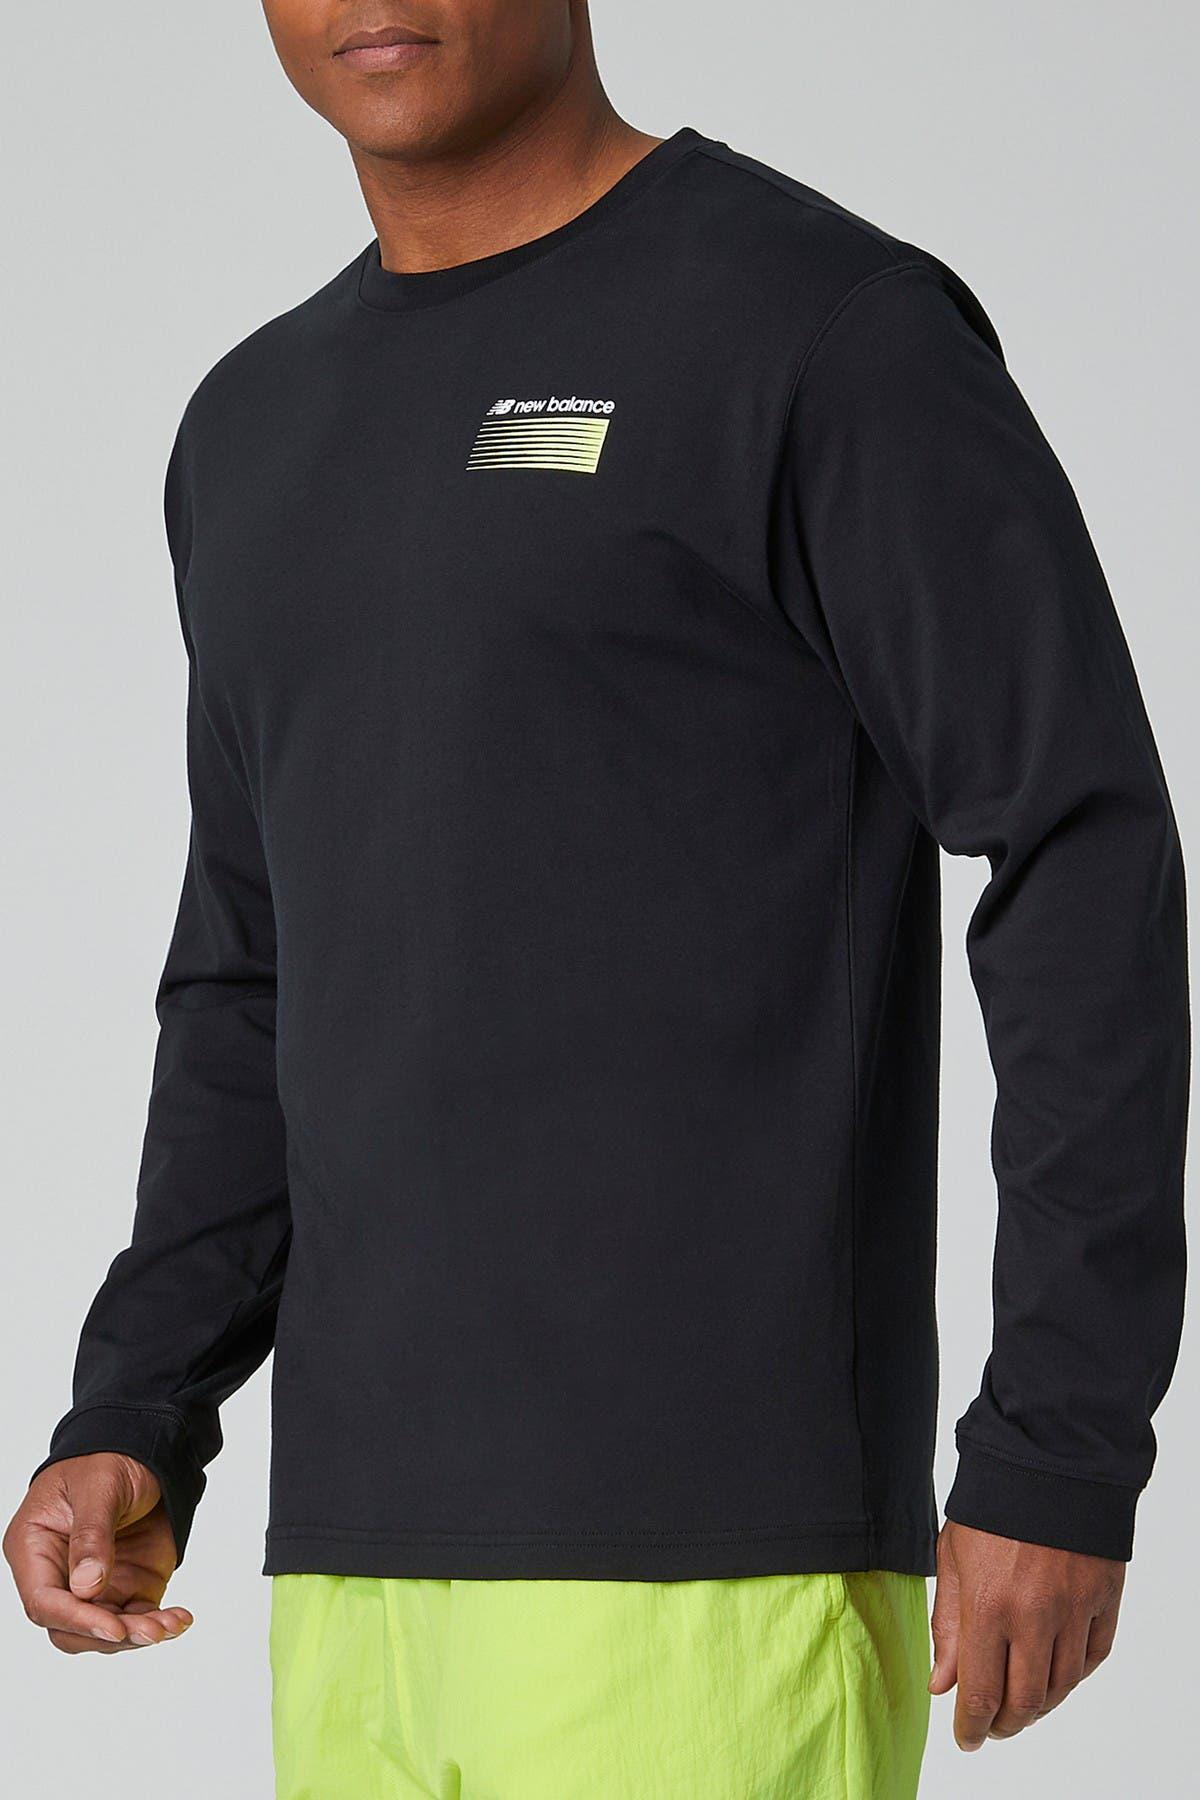 Image of New Balance Sport Style Optiks Long Sleeve T-Shirt